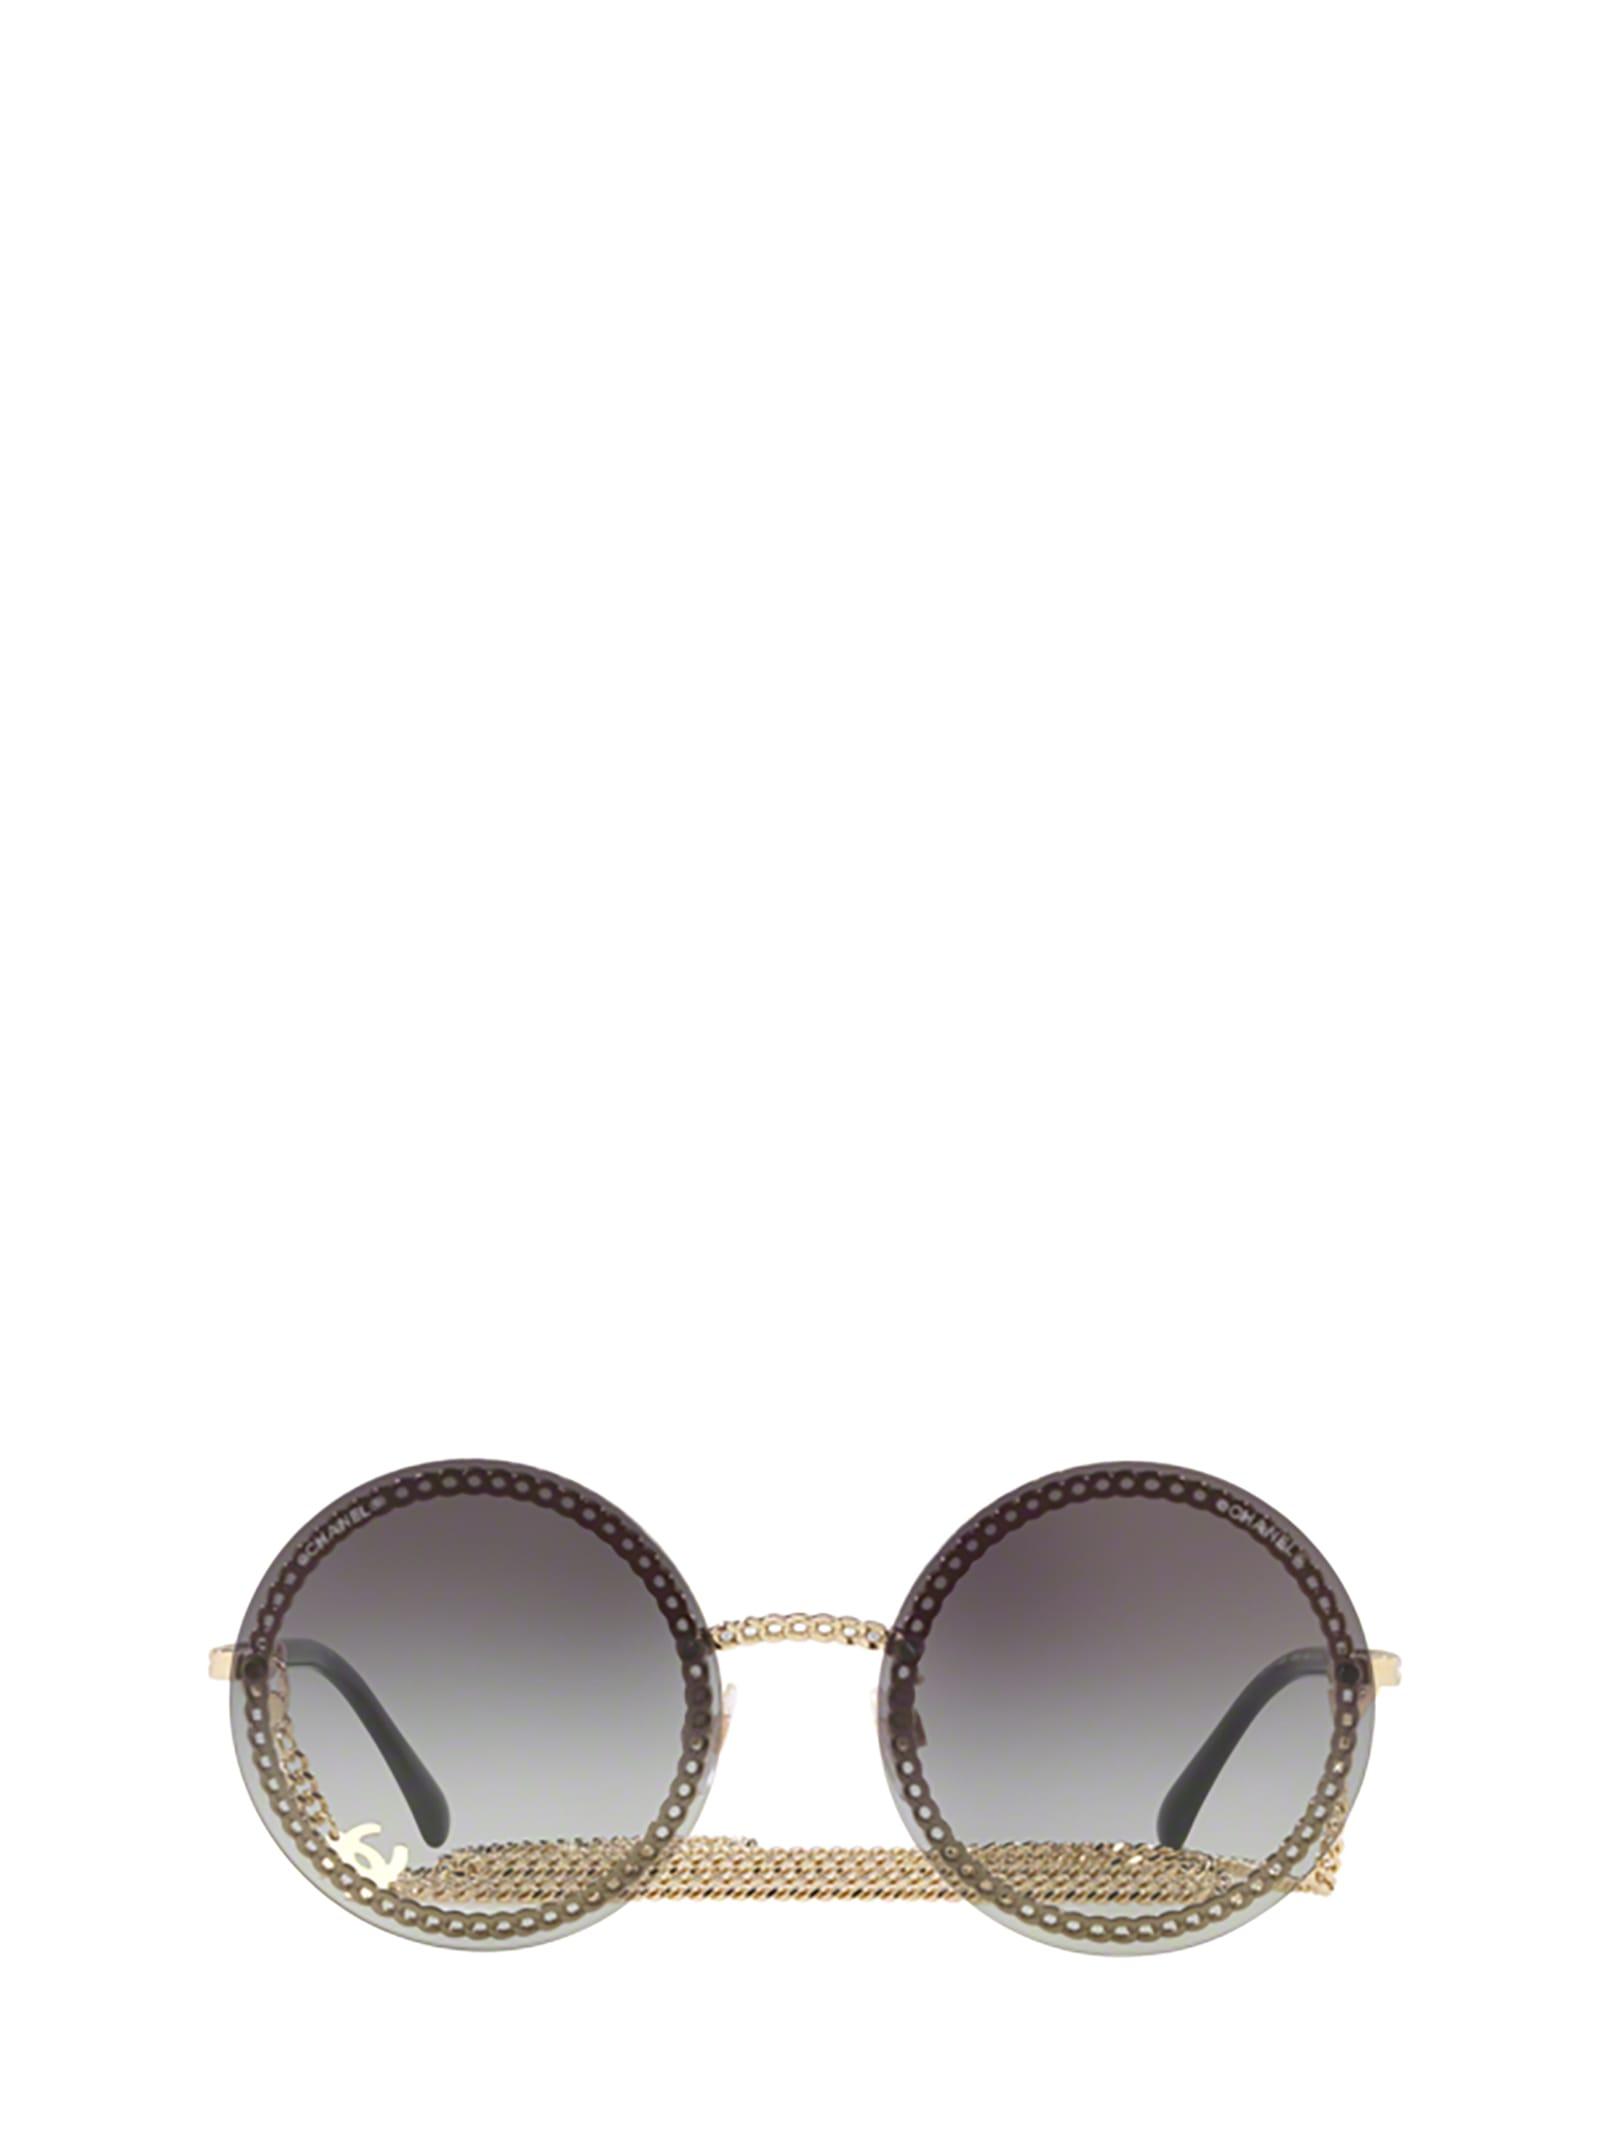 Chanel Chanel Ch4245 Pale Gold Sunglasses